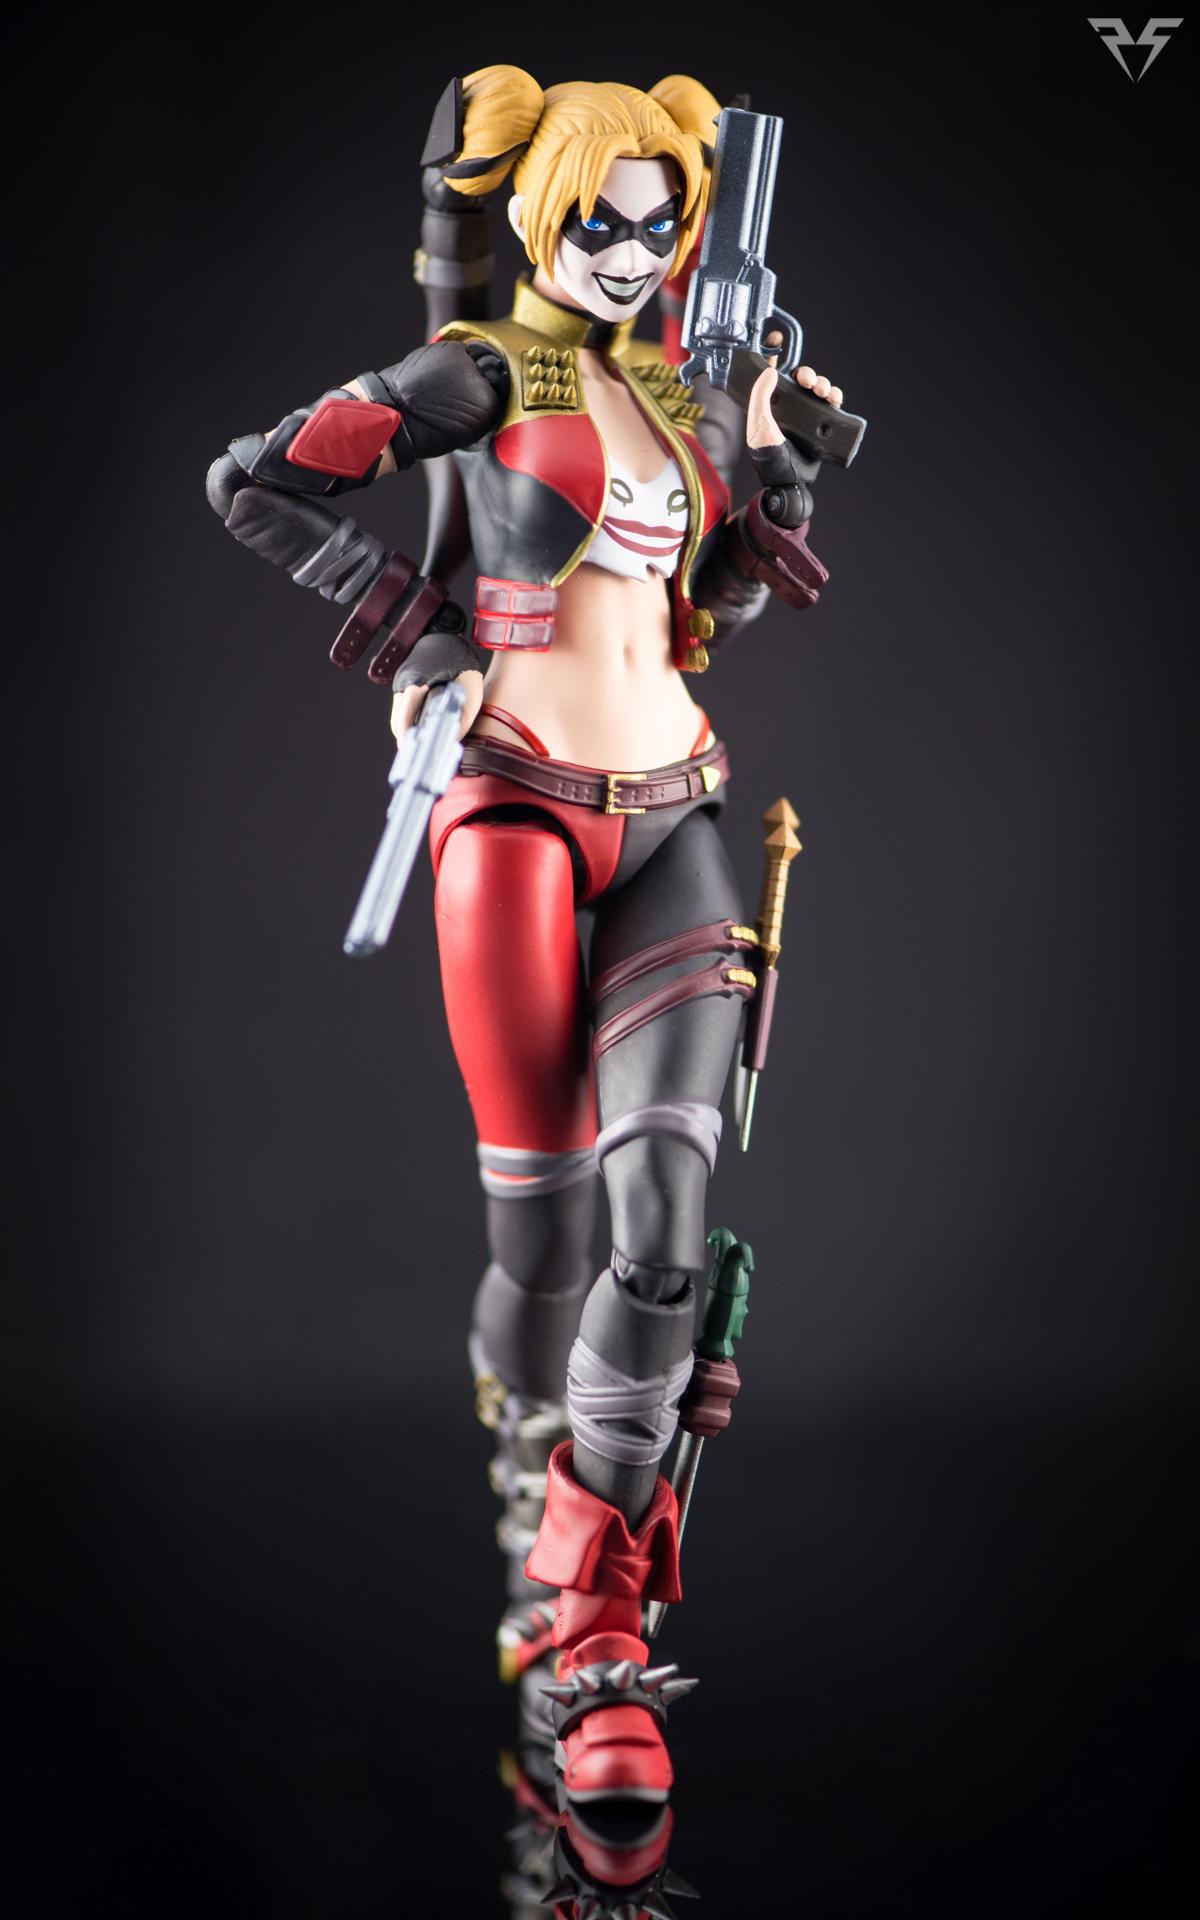 Figuarts Harley Quinn-2.jpg